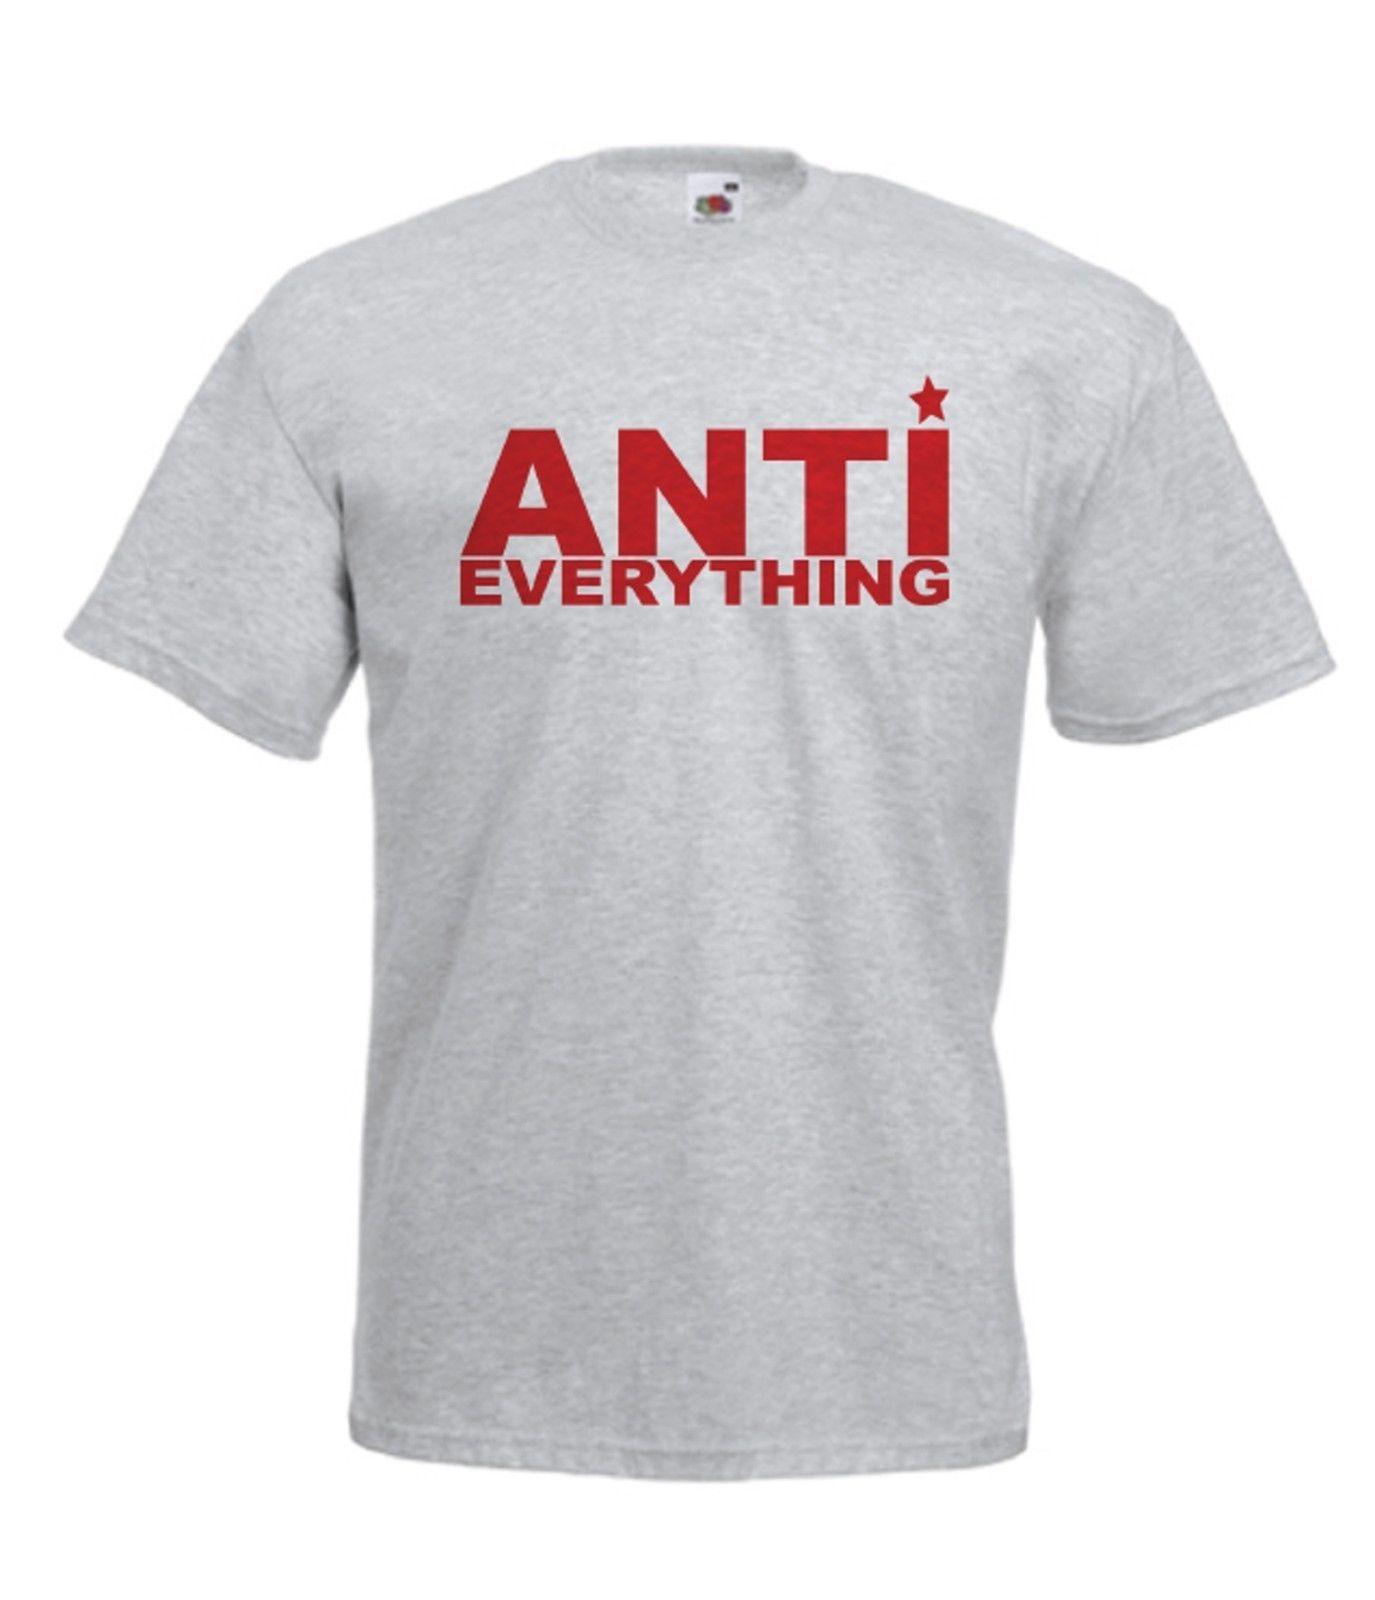 ANTI EVERYTHING PUNK Music Xmas Birthday Gift Idea Mens Womens Adult T SHIRT TOP Denim Shirts Design From Summernight88 1148